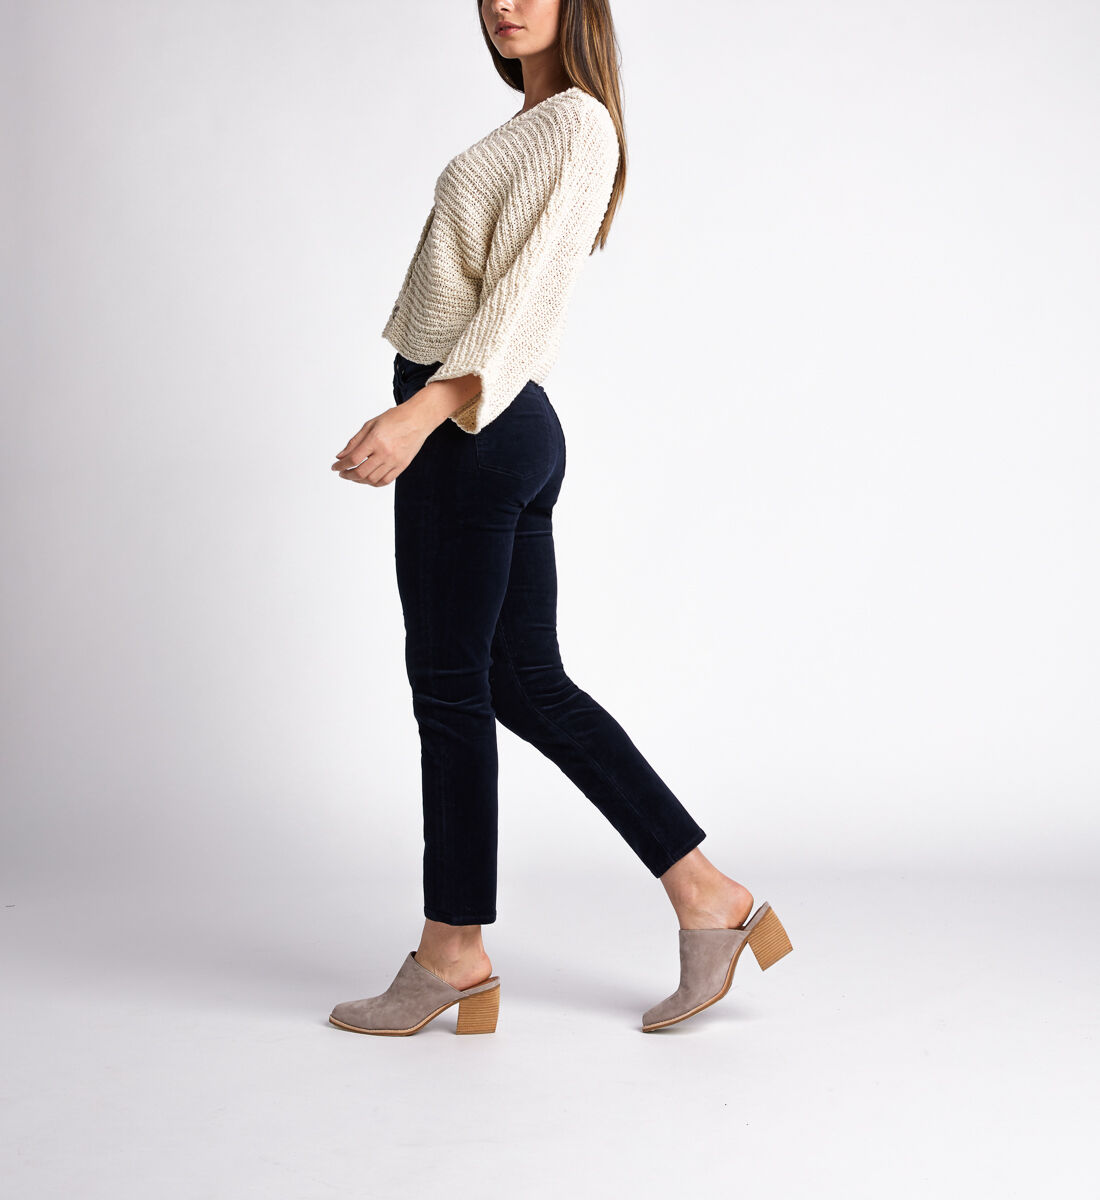 High Note High Rise Slim Leg Pants,Navy Side